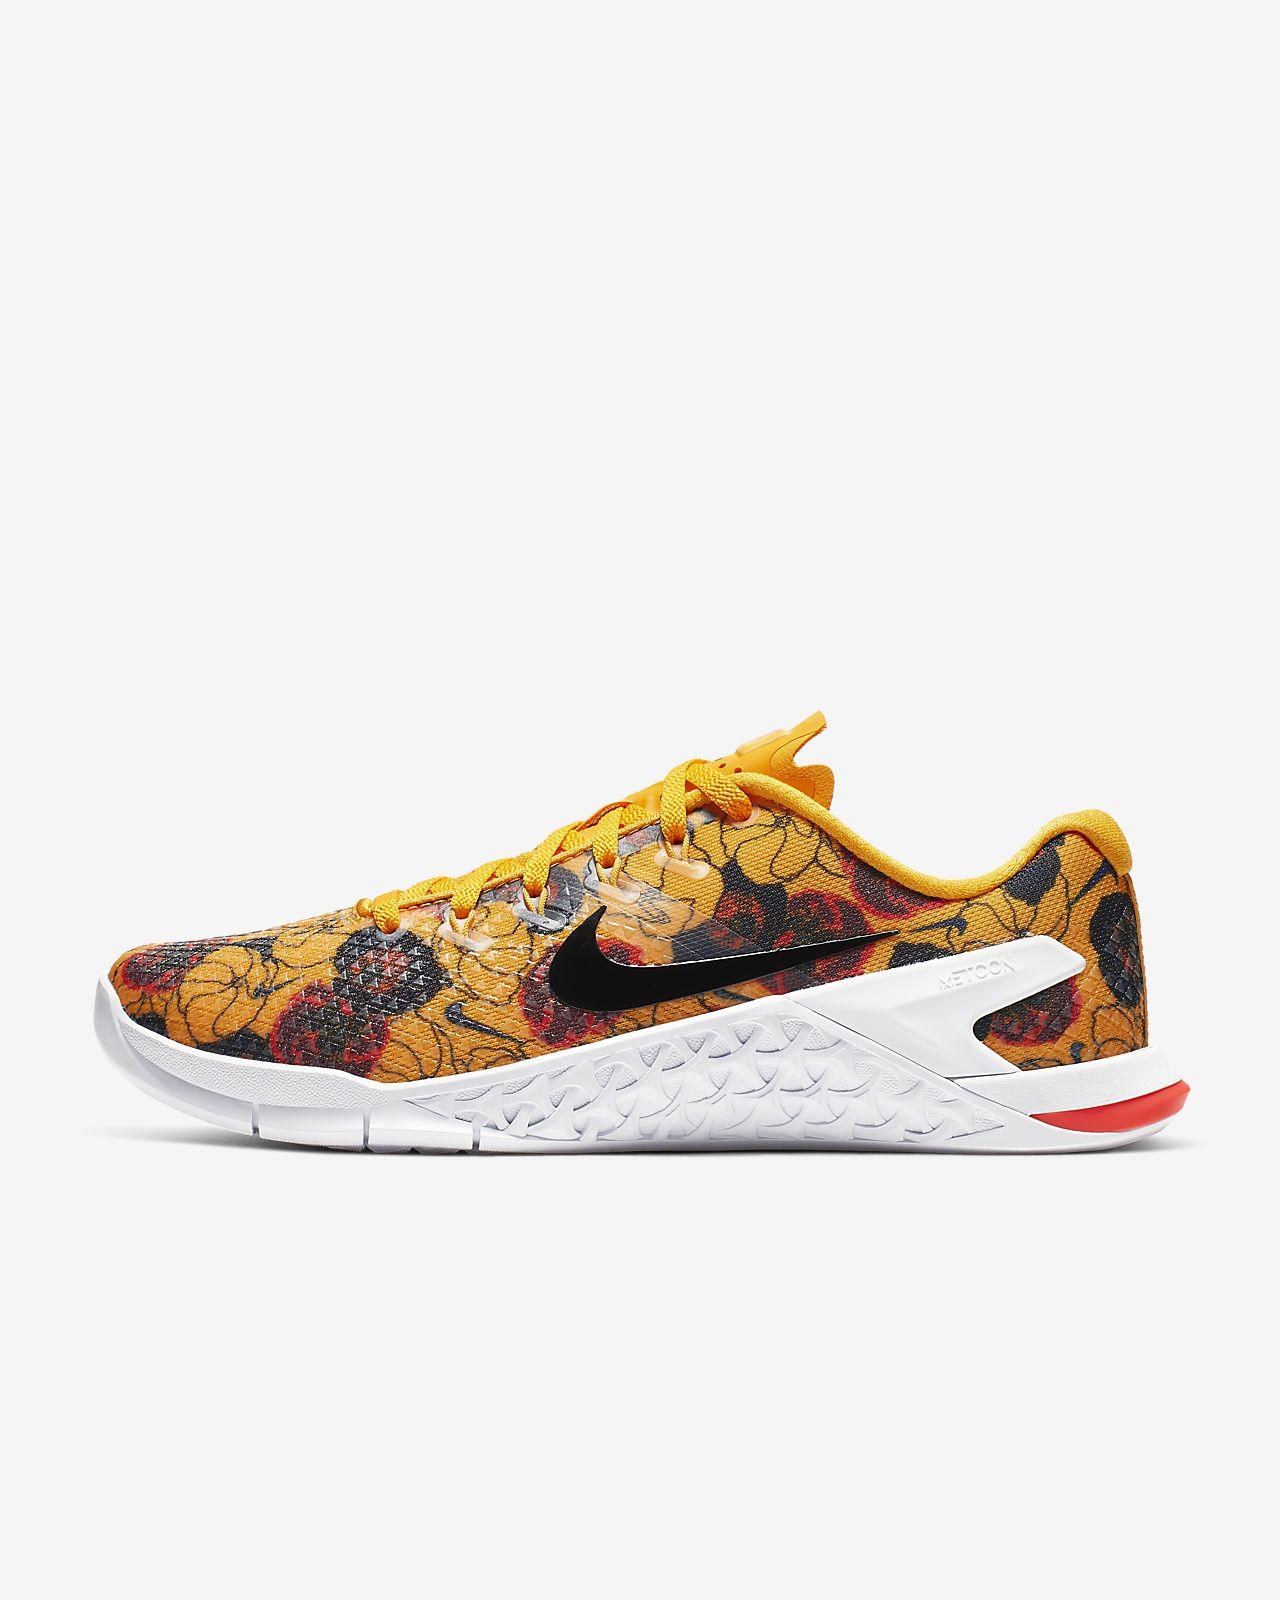 Nike Metcon 4 XD Premium Women's Training Shoe